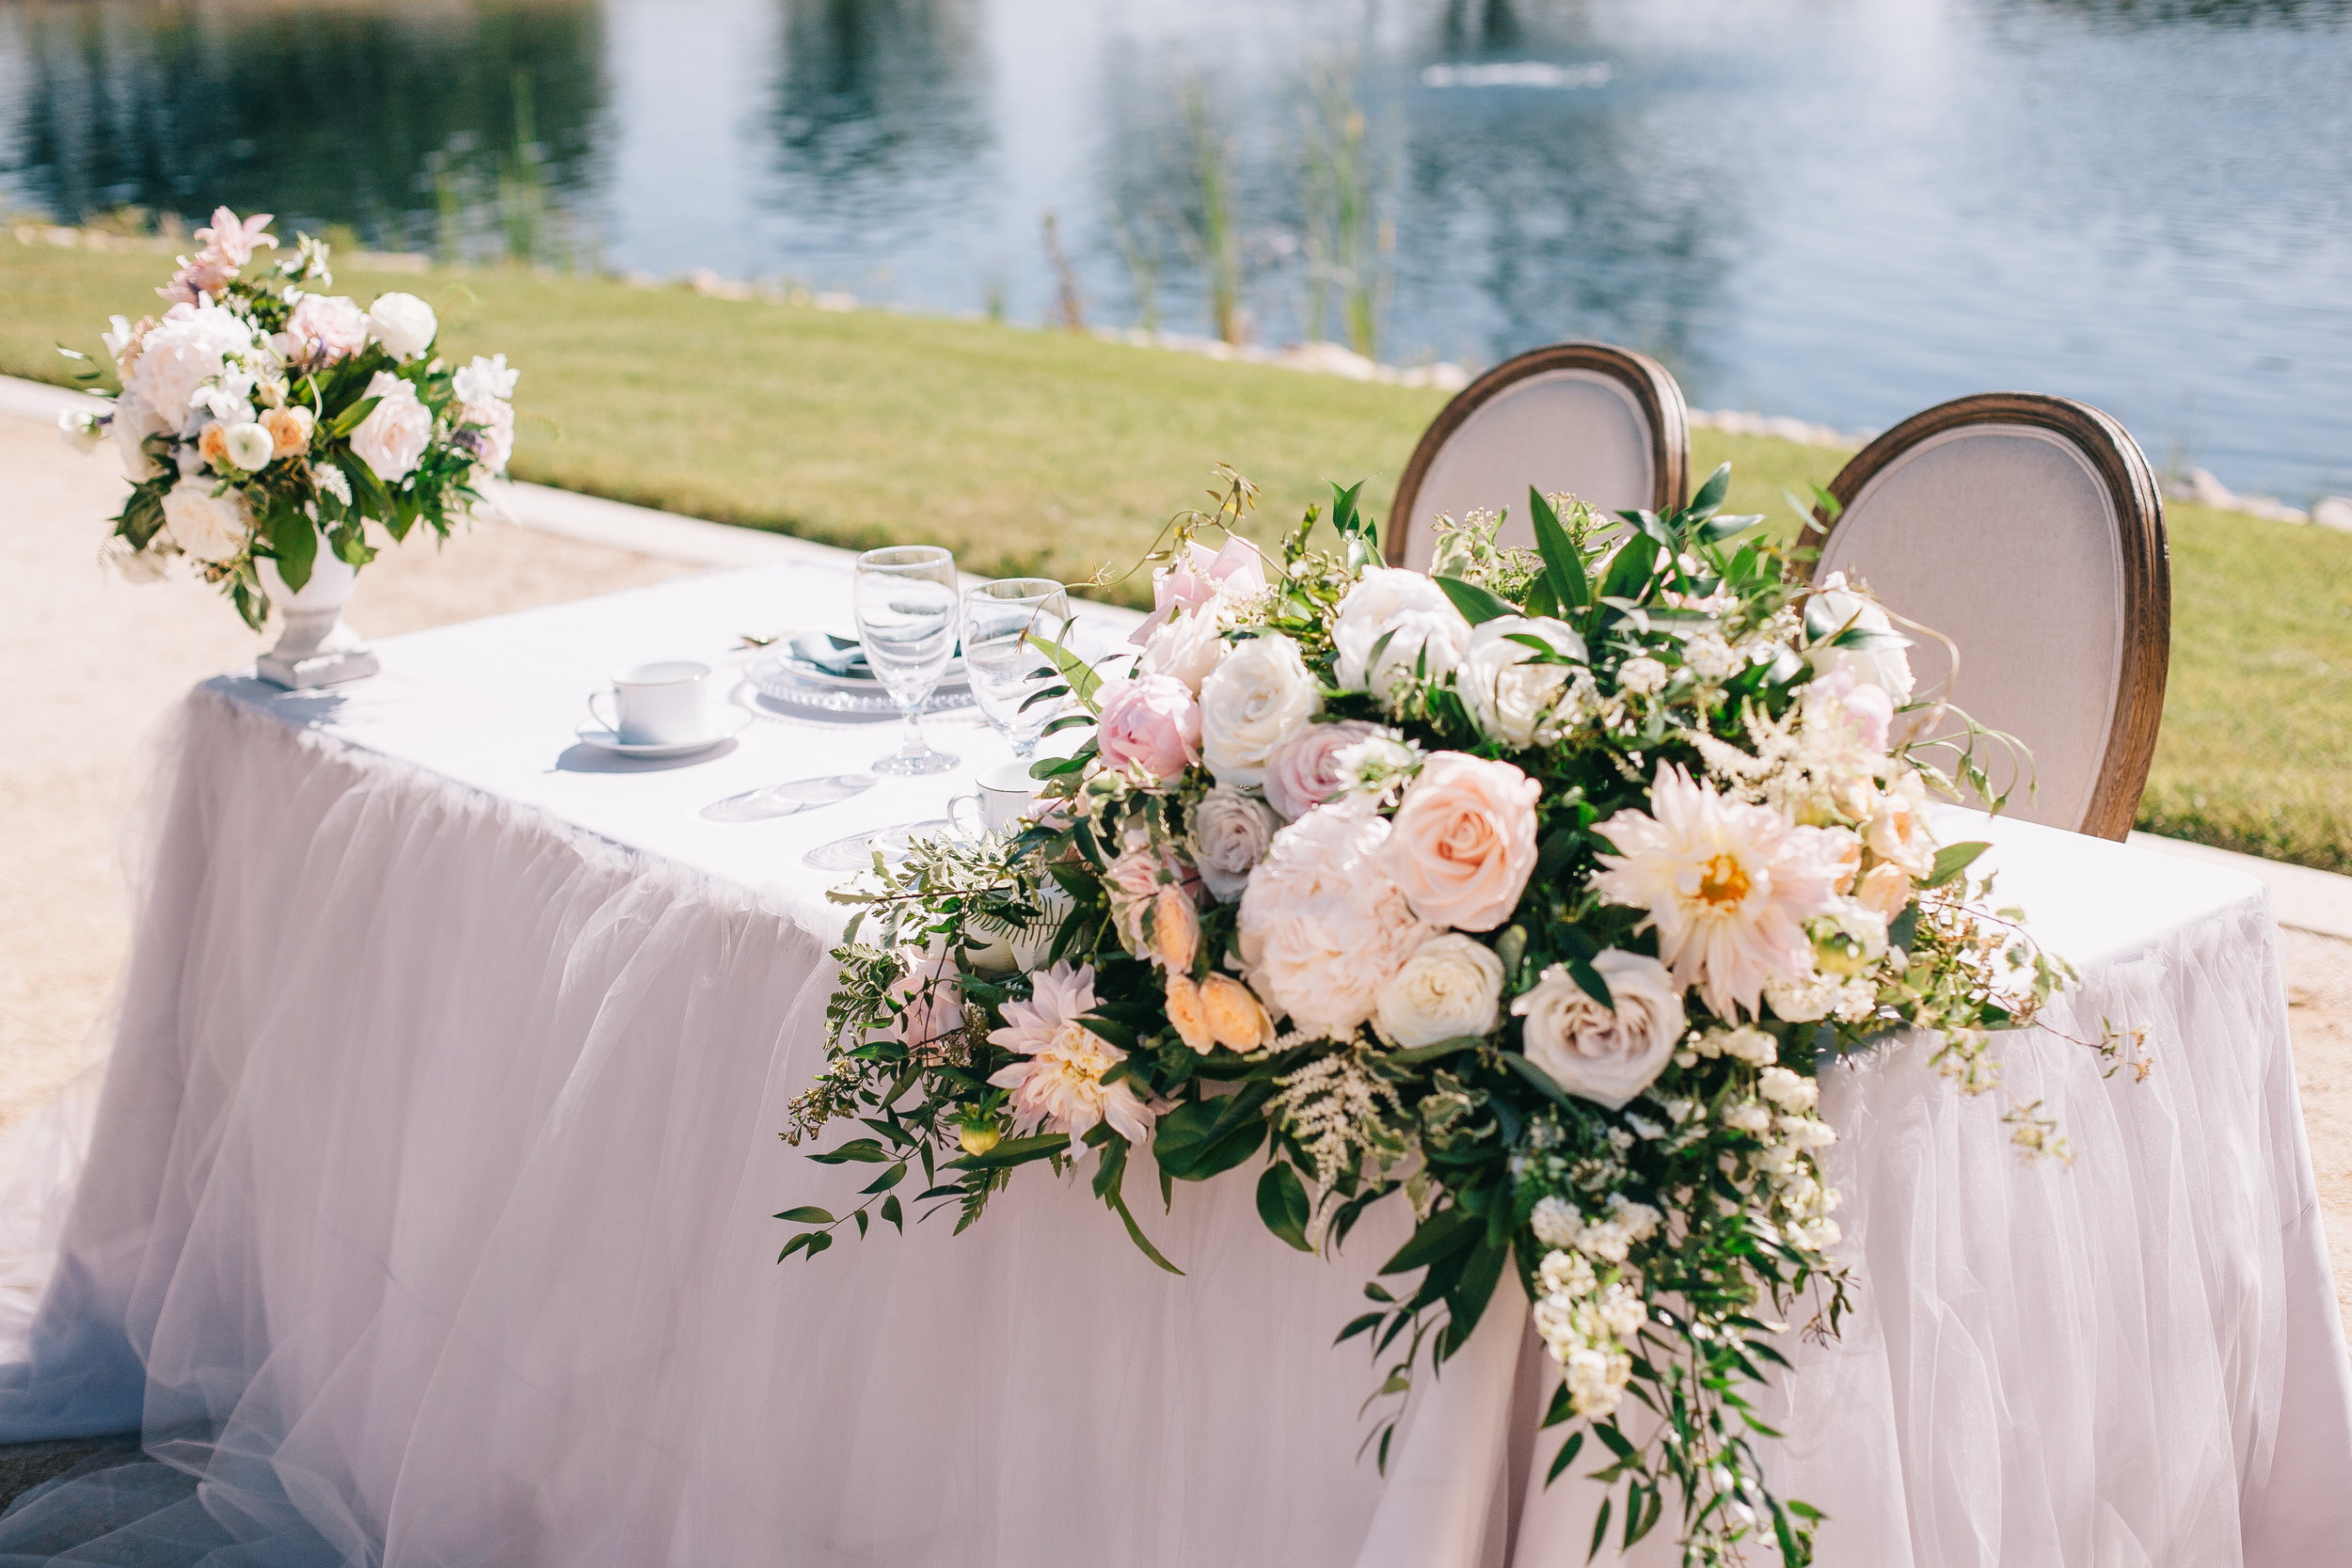 Violette-fleurs-event-design-roseville-anna-perevertaylo-rancho-robles-vinyards-Detail-Destination-Wedding-Design-Blush-sweetheart-table.jpg